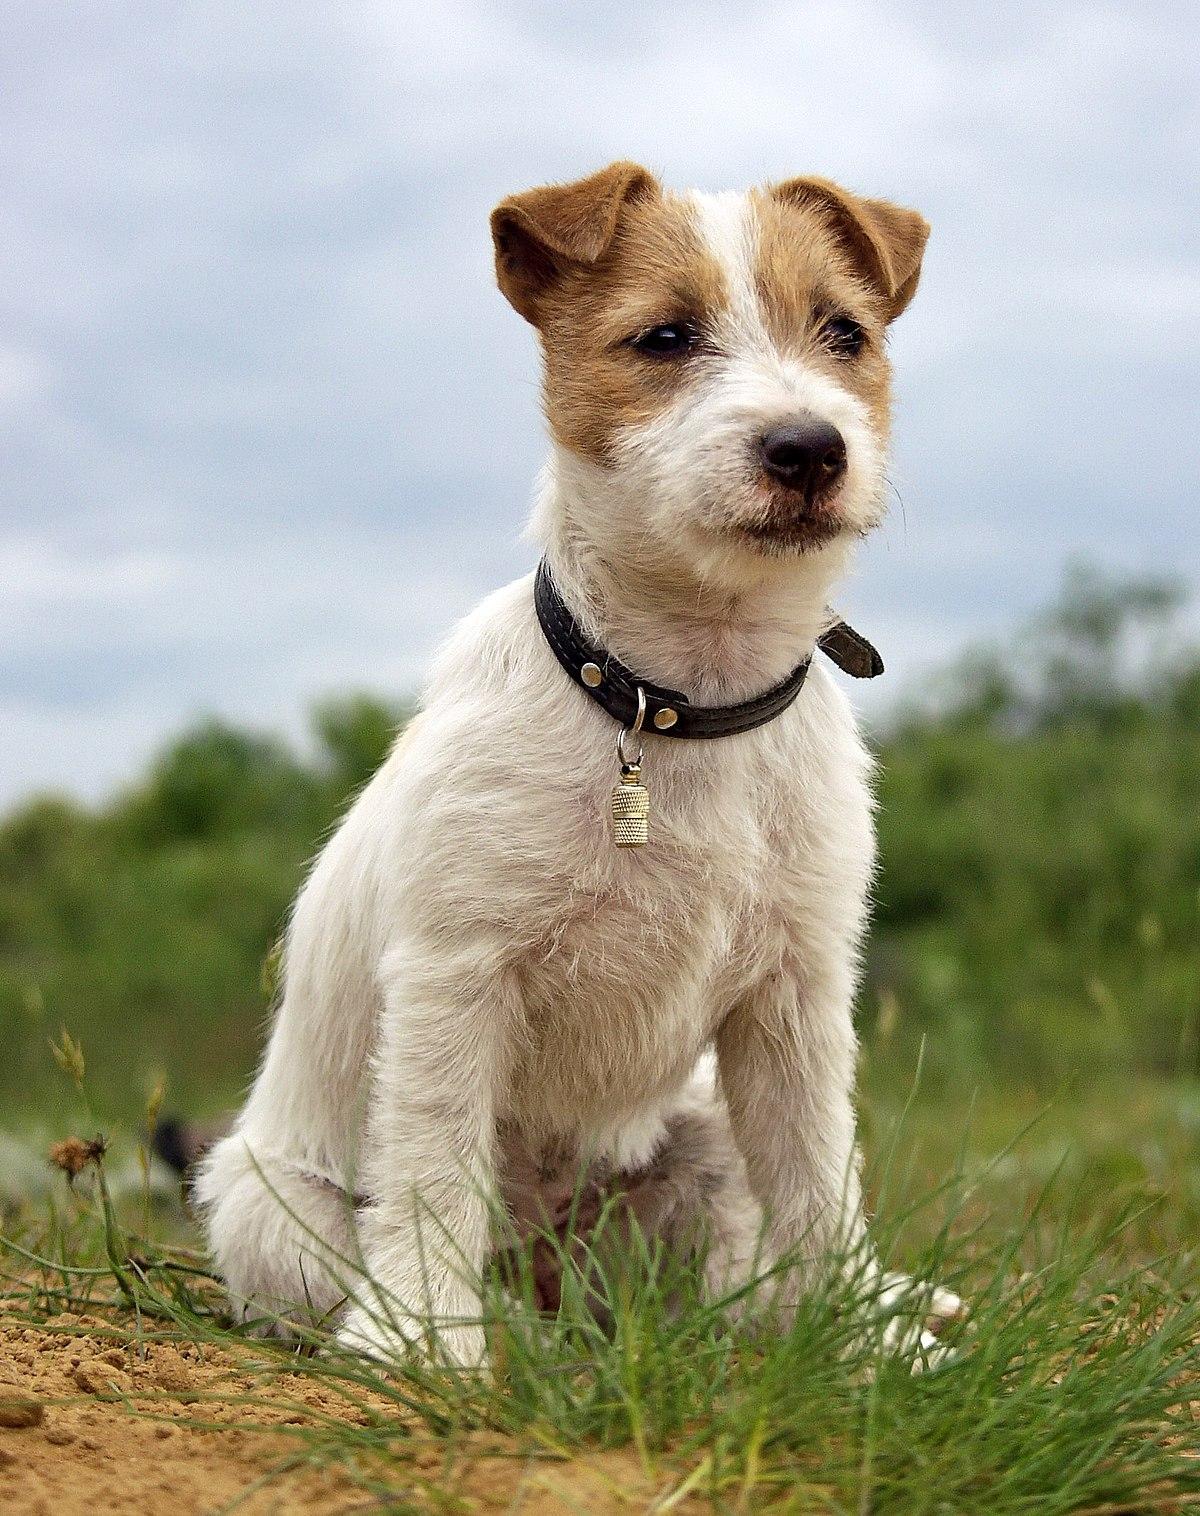 jack russell terrier wikipedia wolna encyklopedia. Black Bedroom Furniture Sets. Home Design Ideas